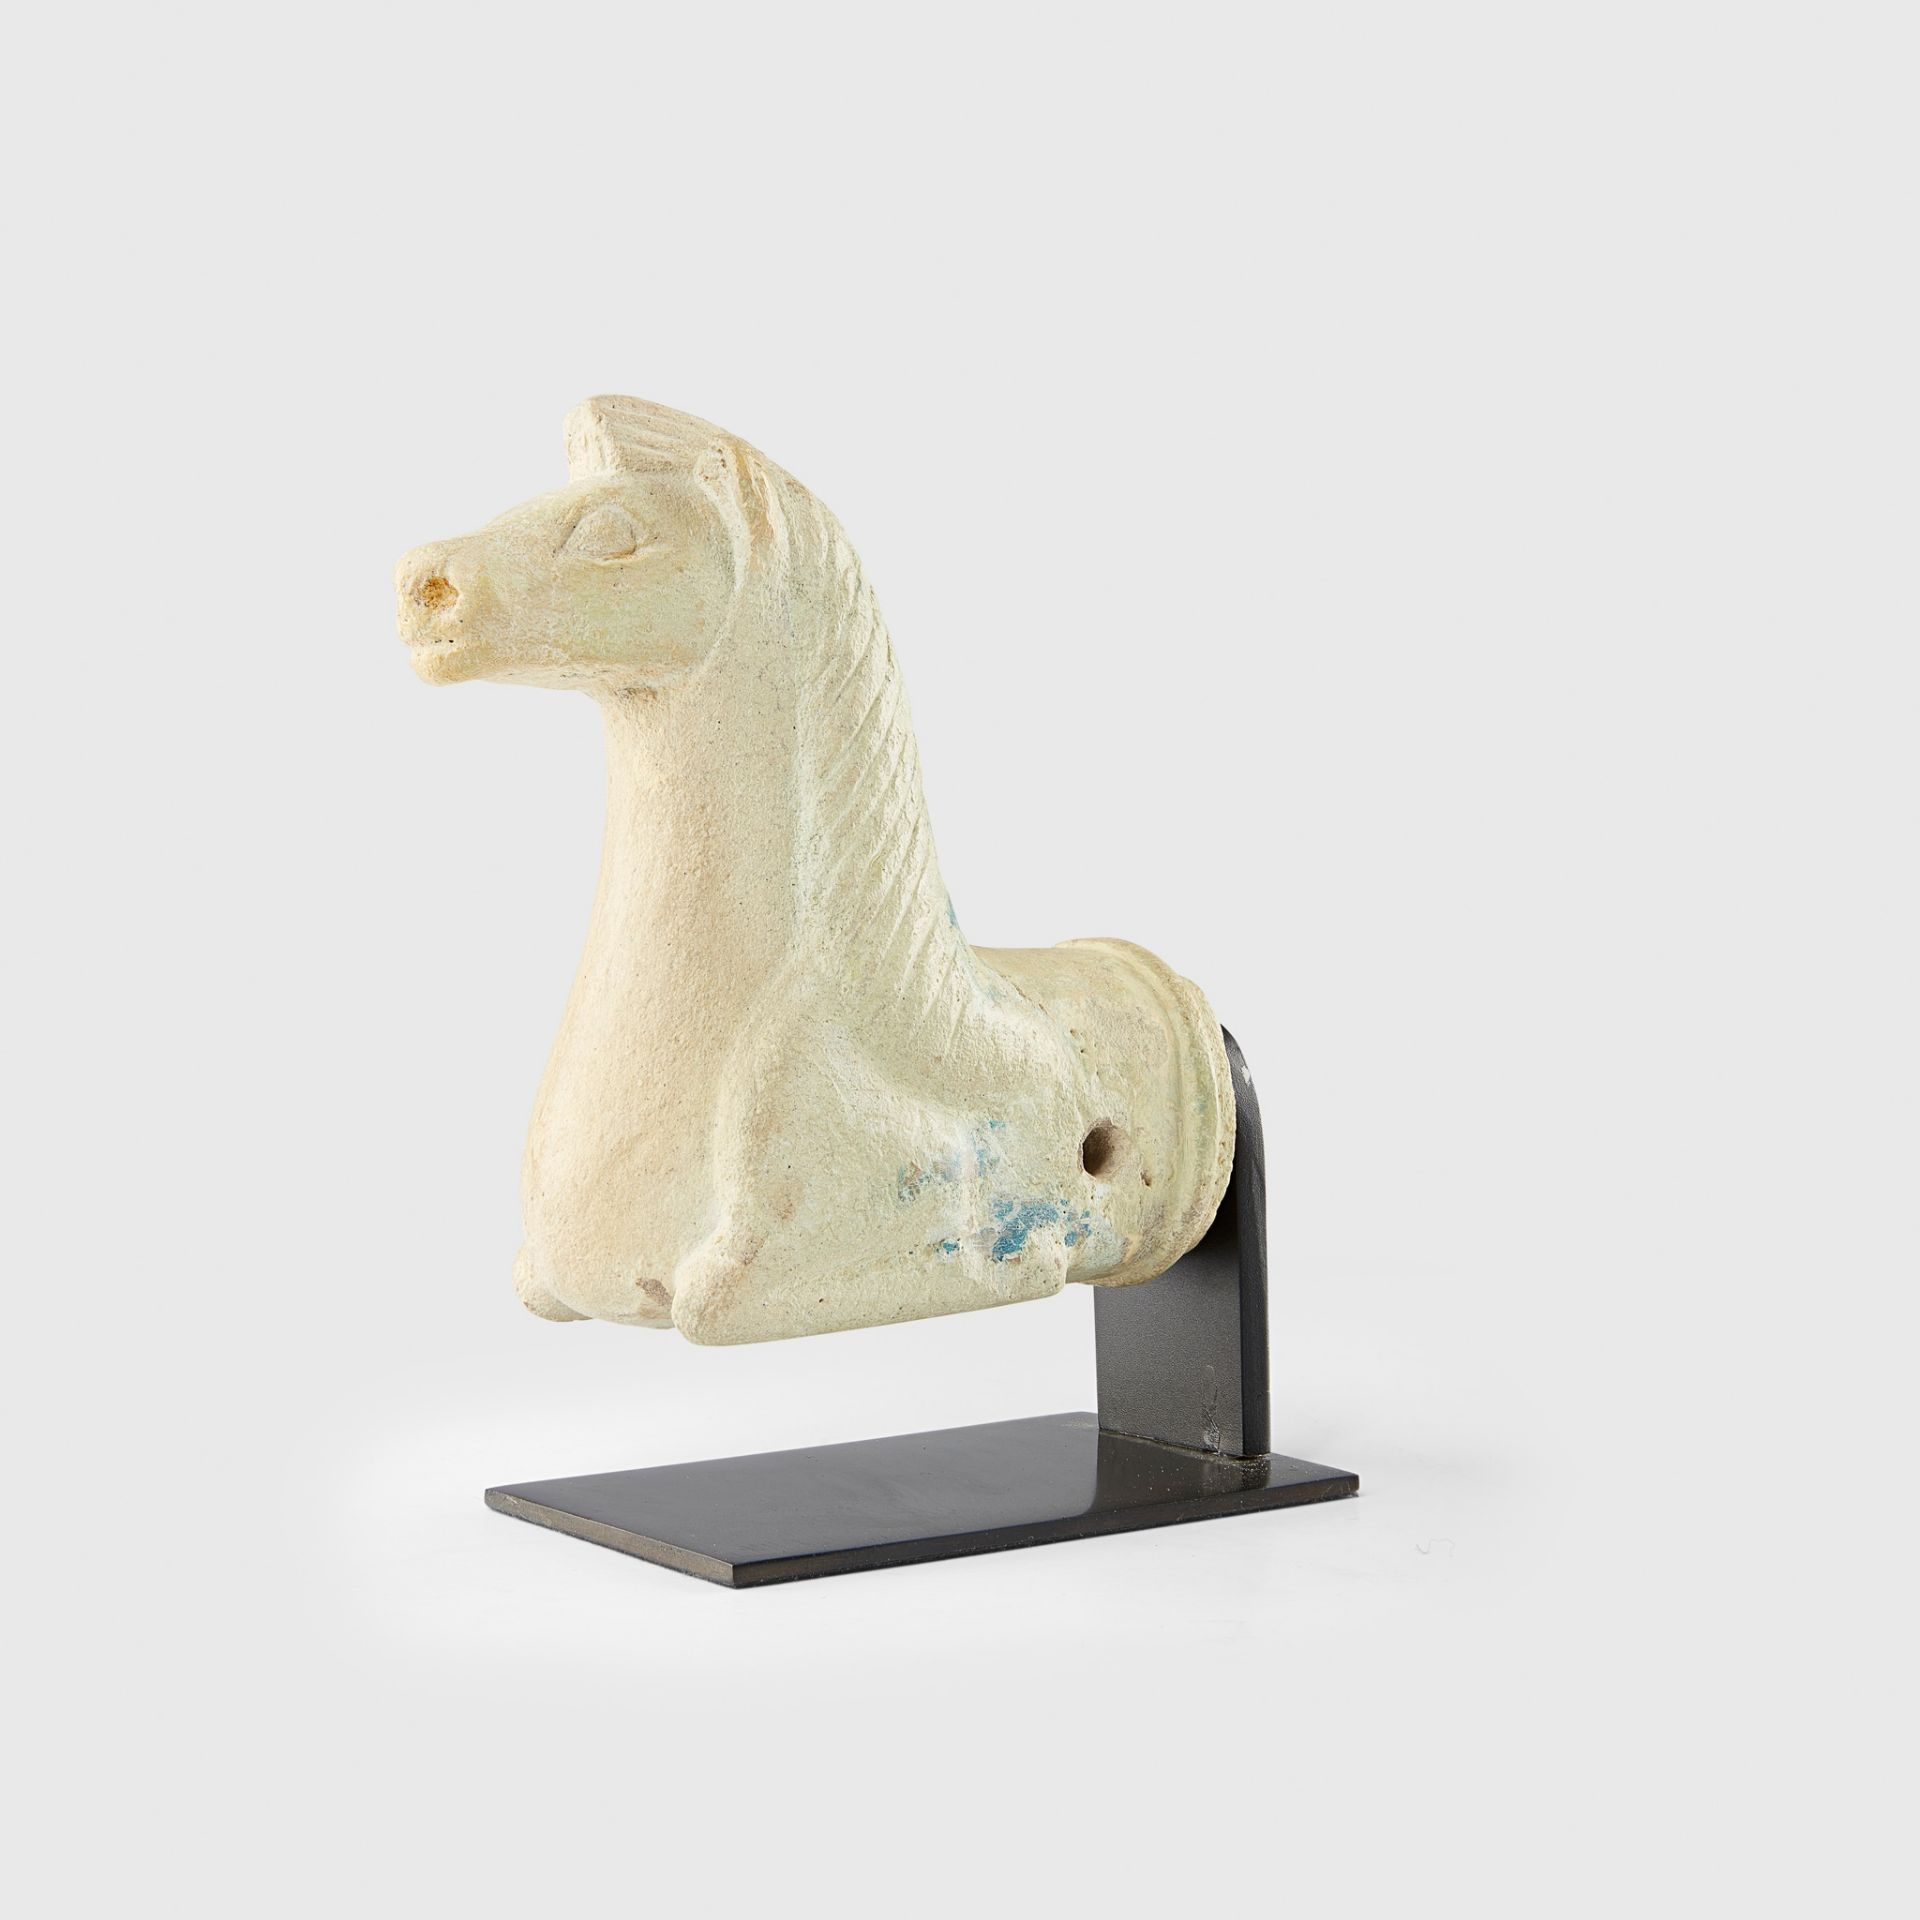 ZIWIYE HORSE PROTOME NEAR EAST, 9TH - 8TH CENTURY B.C.